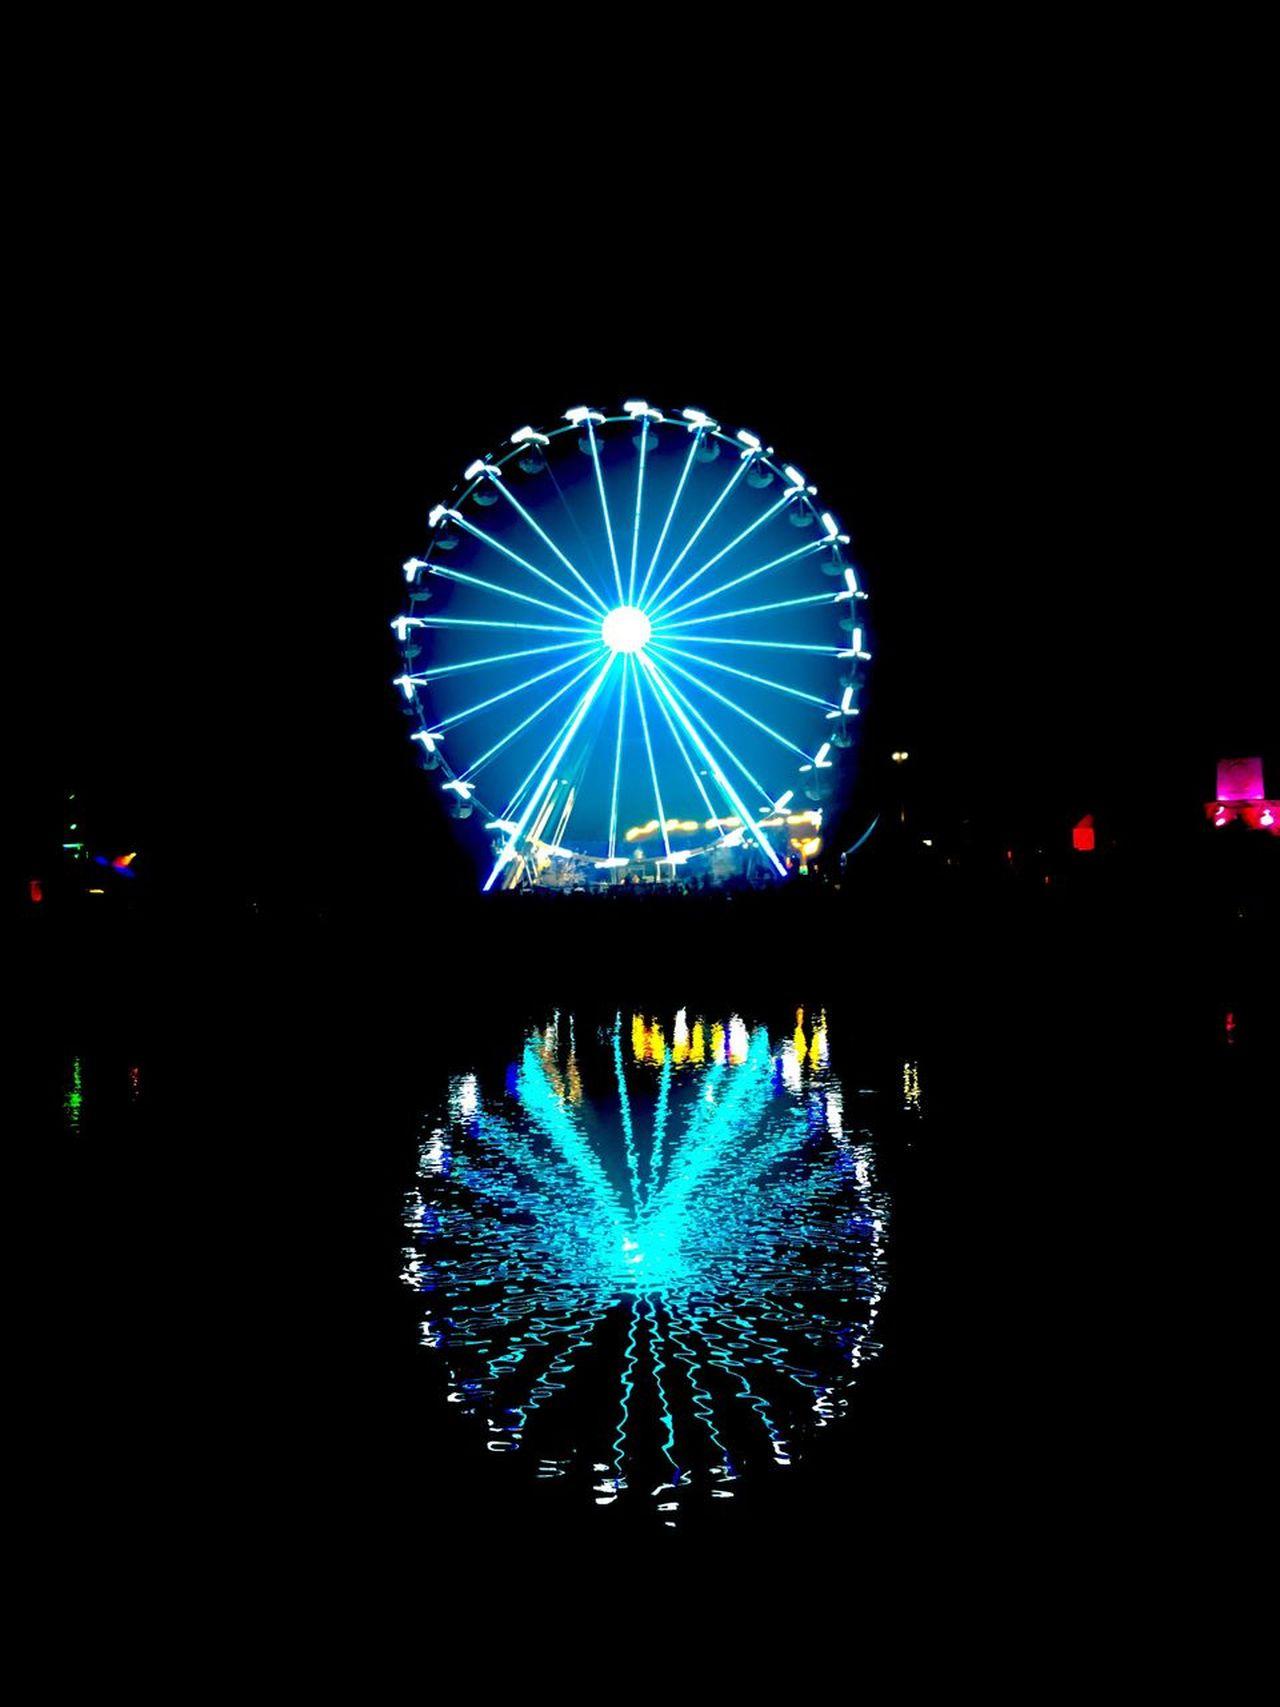 Illuminated Night Arts Culture And Entertainment Multi Colored Long Exposure Amusement Park Celebration No People Ferris Wheel Sky Clear Sky Outdoors